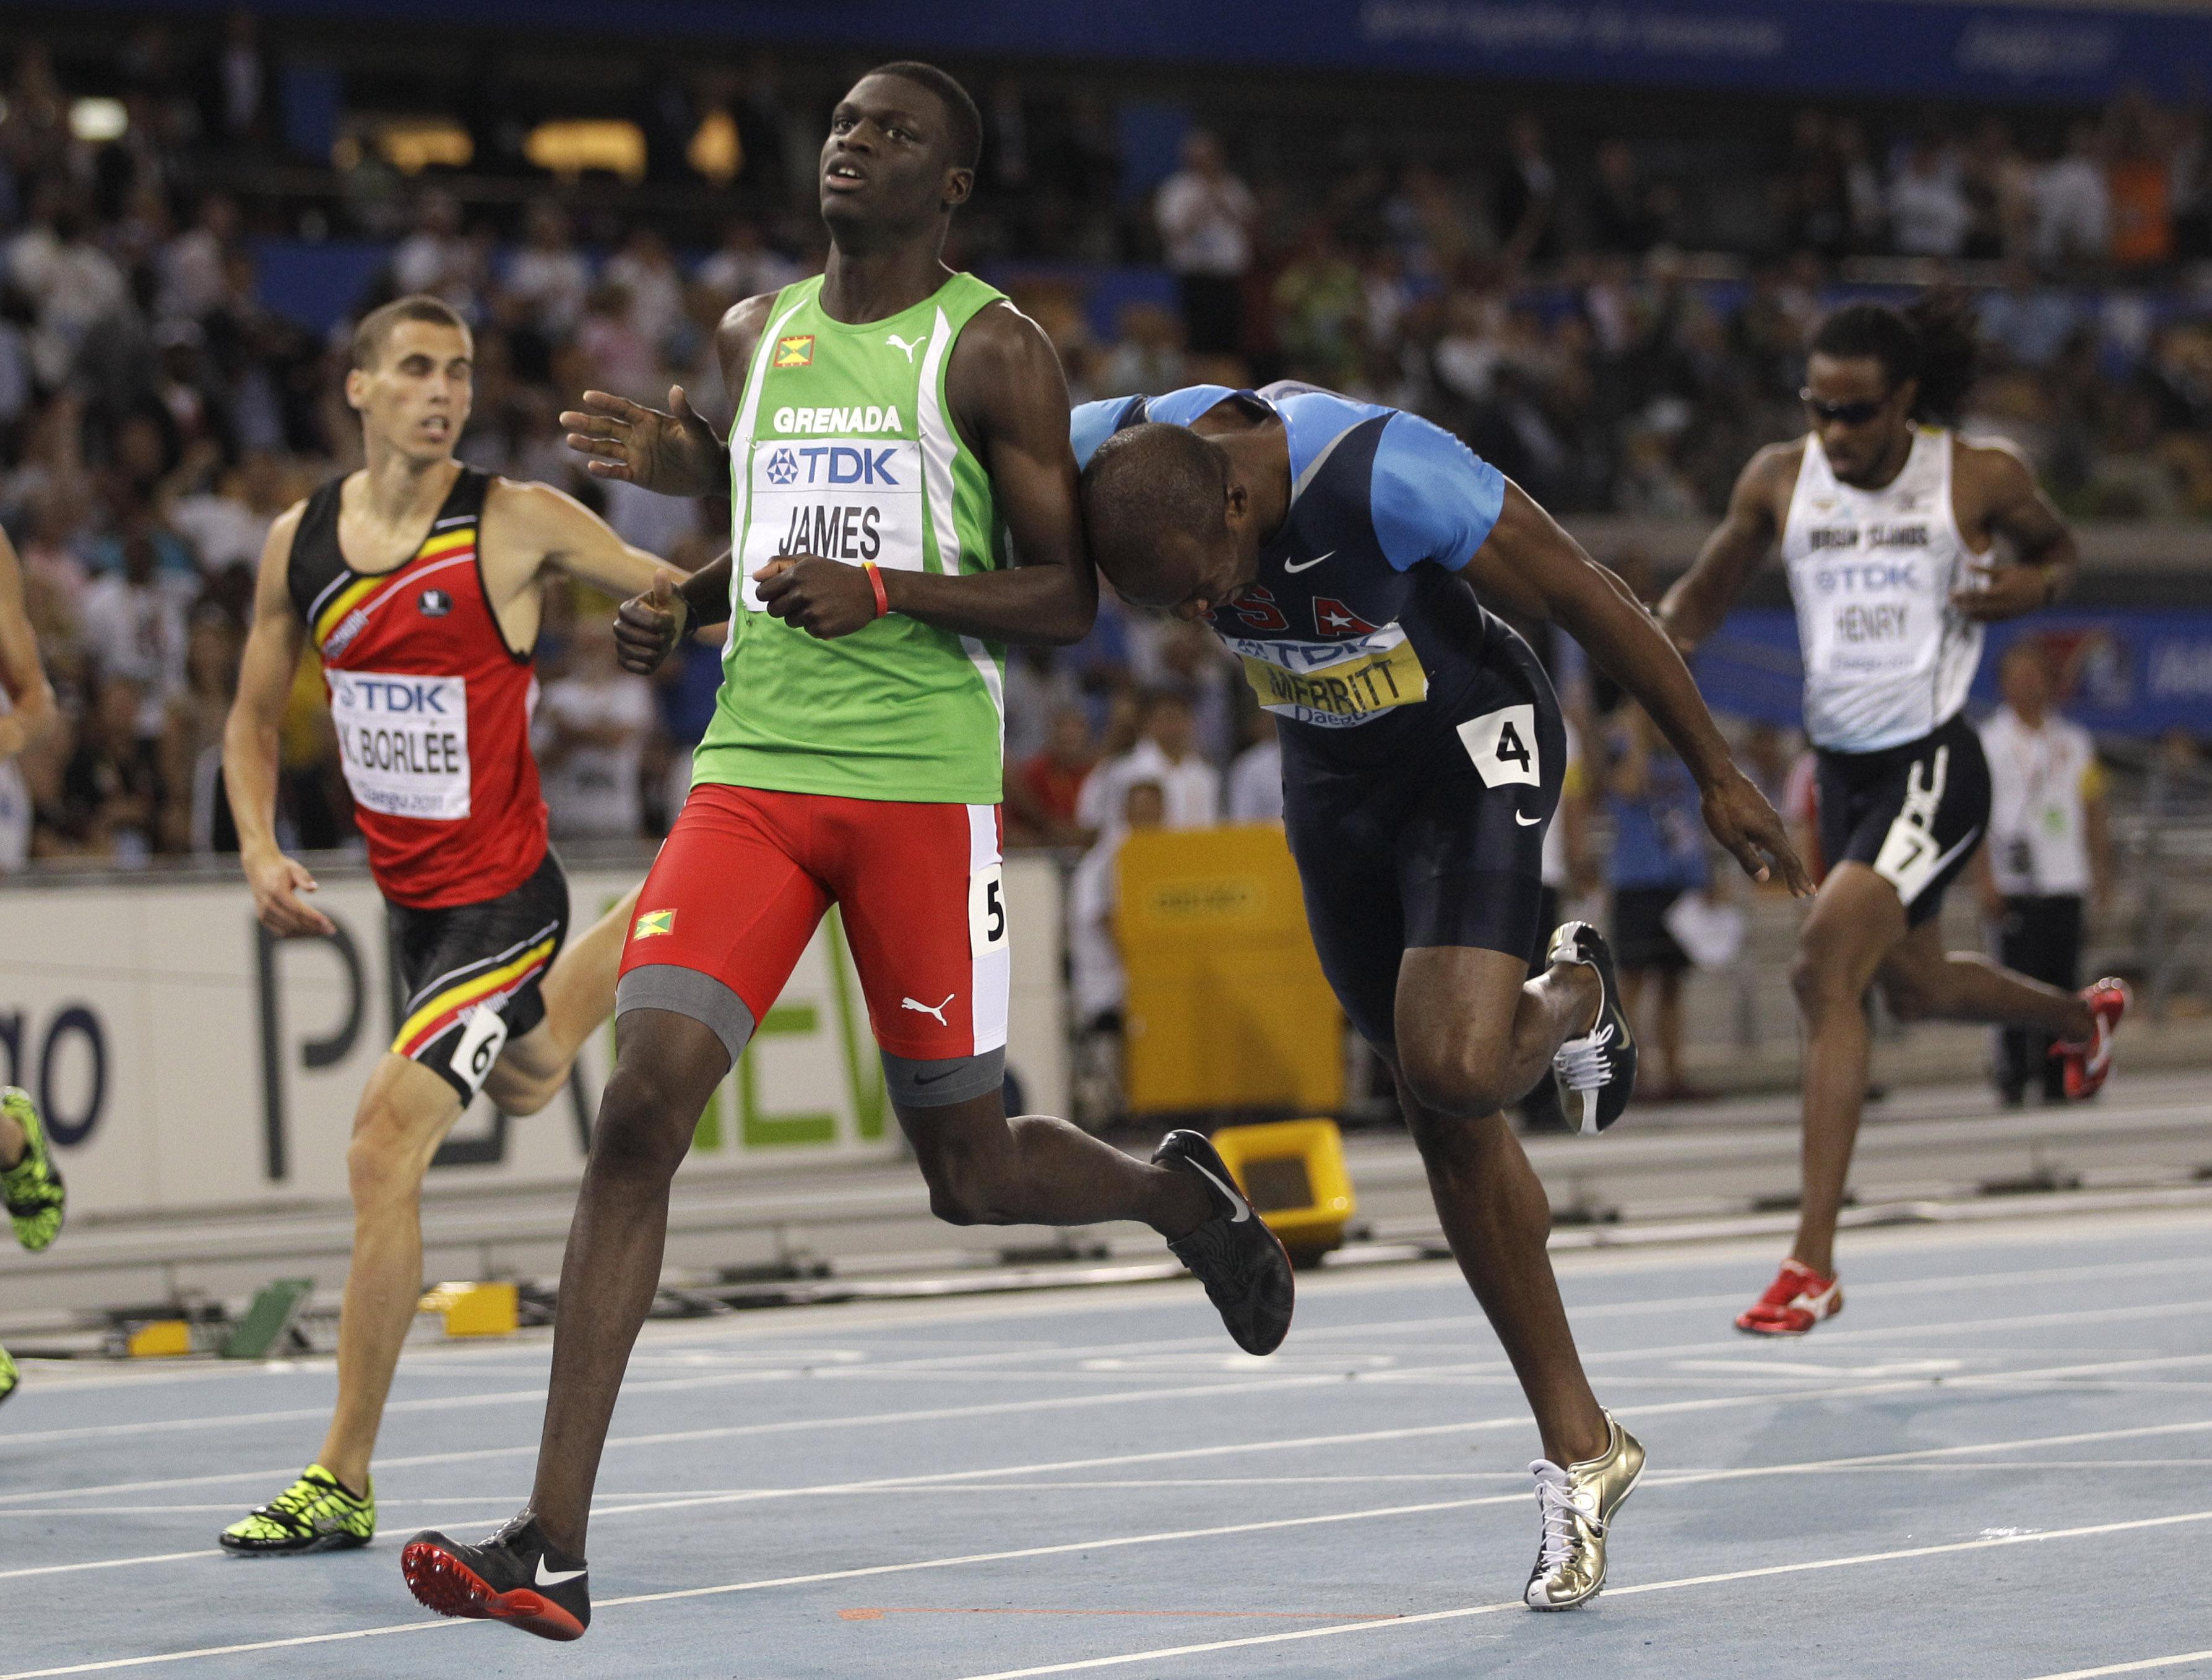 Grenada's Kirani James wins 400 at worlds - CBS News